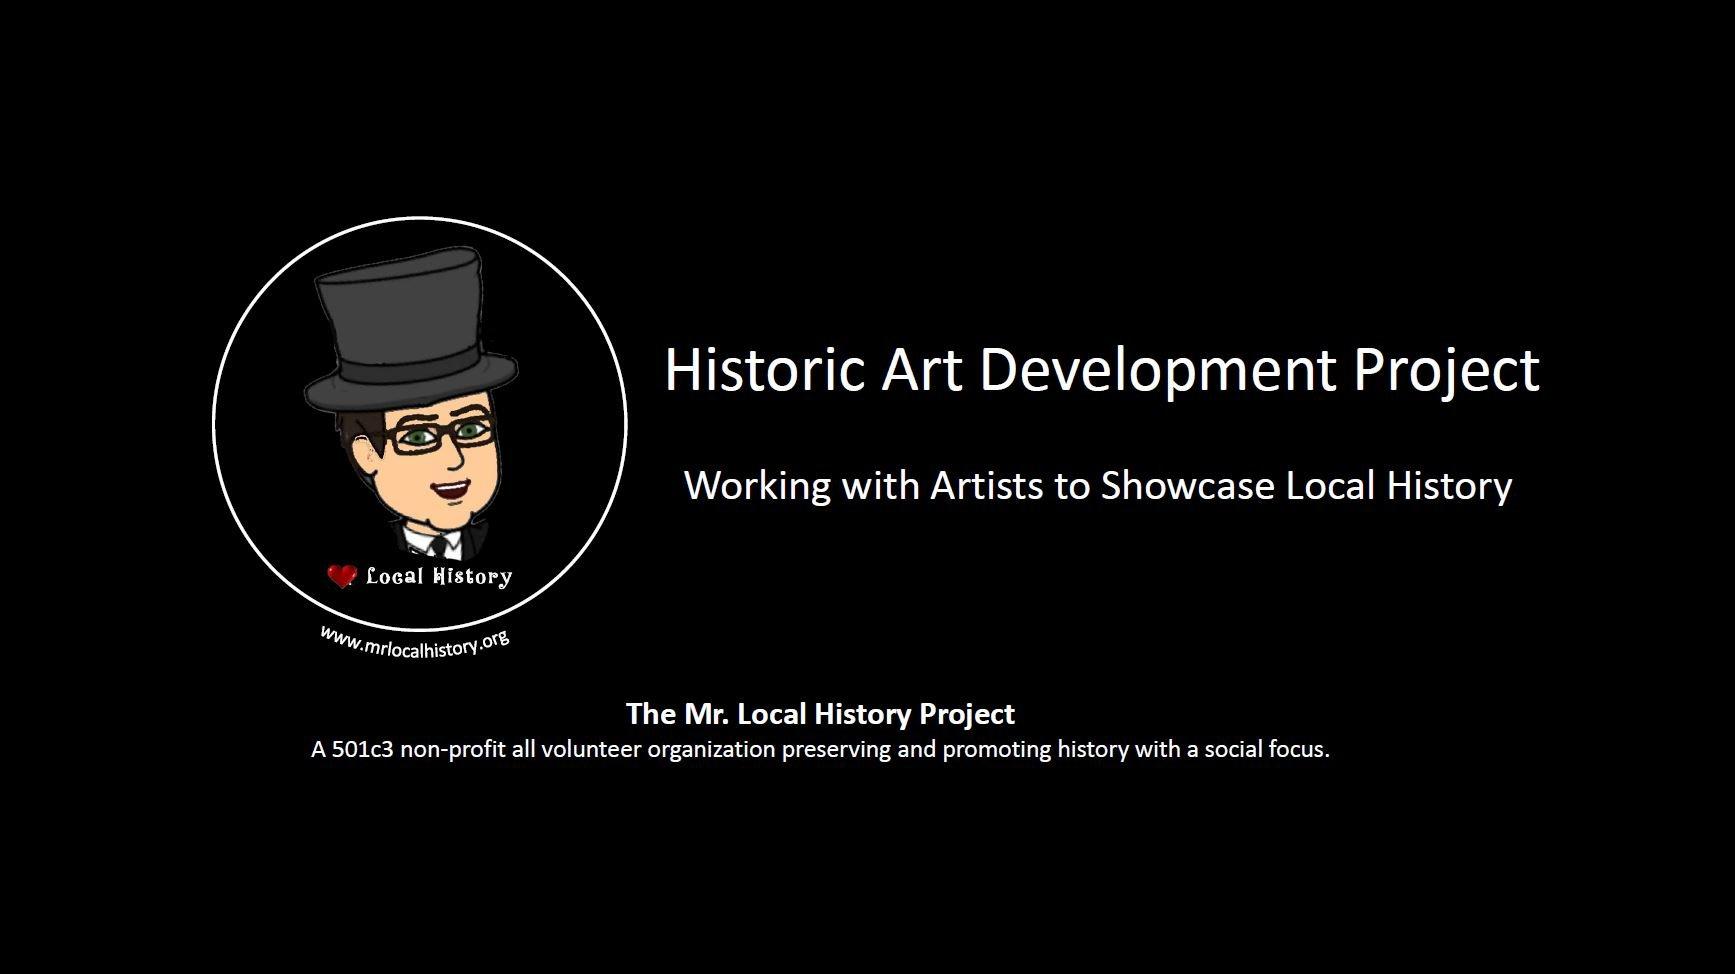 The Mr. Local History Art Initiative